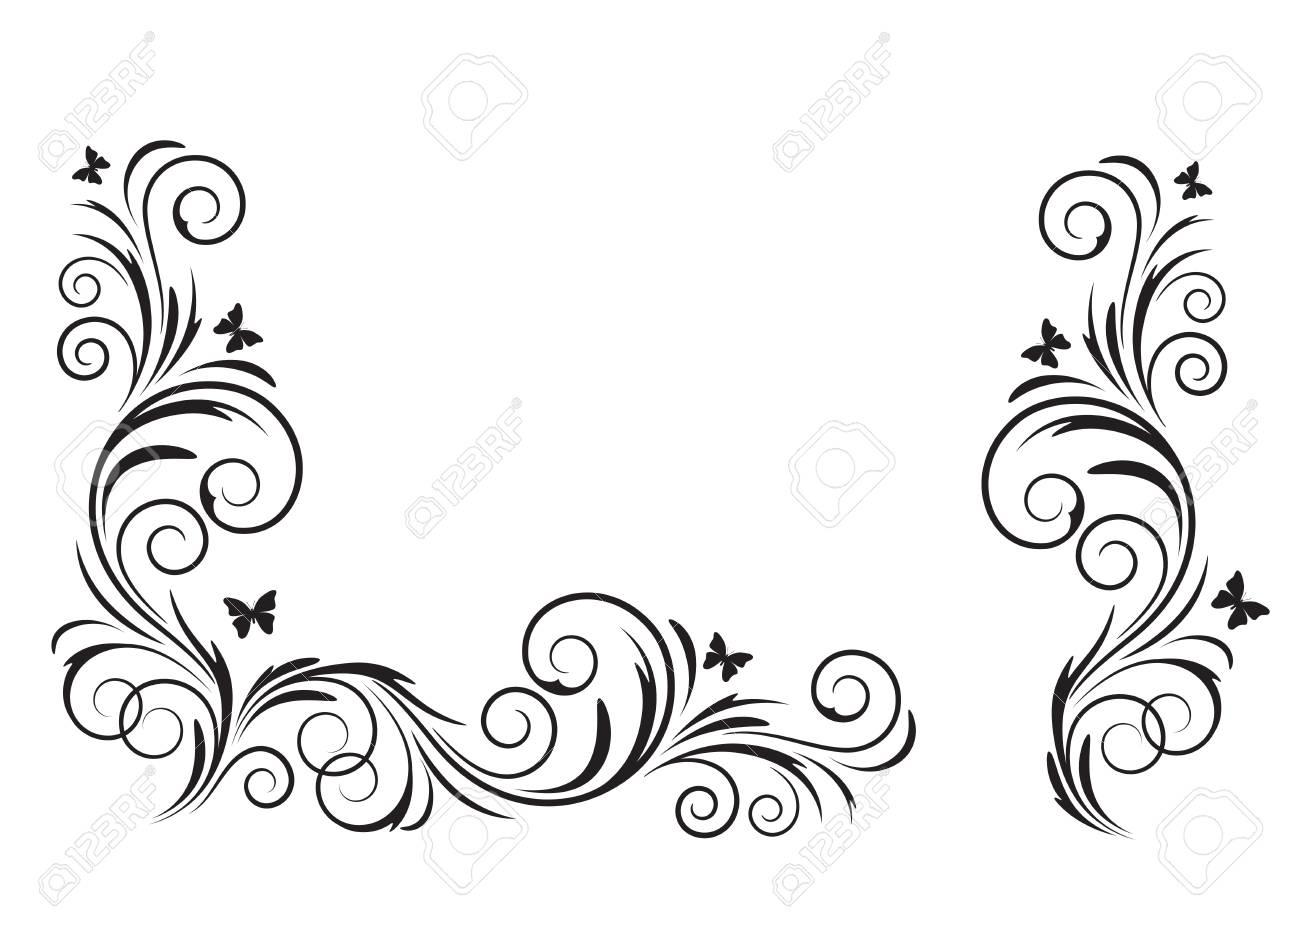 Decorative black floral element and corner, stencils.